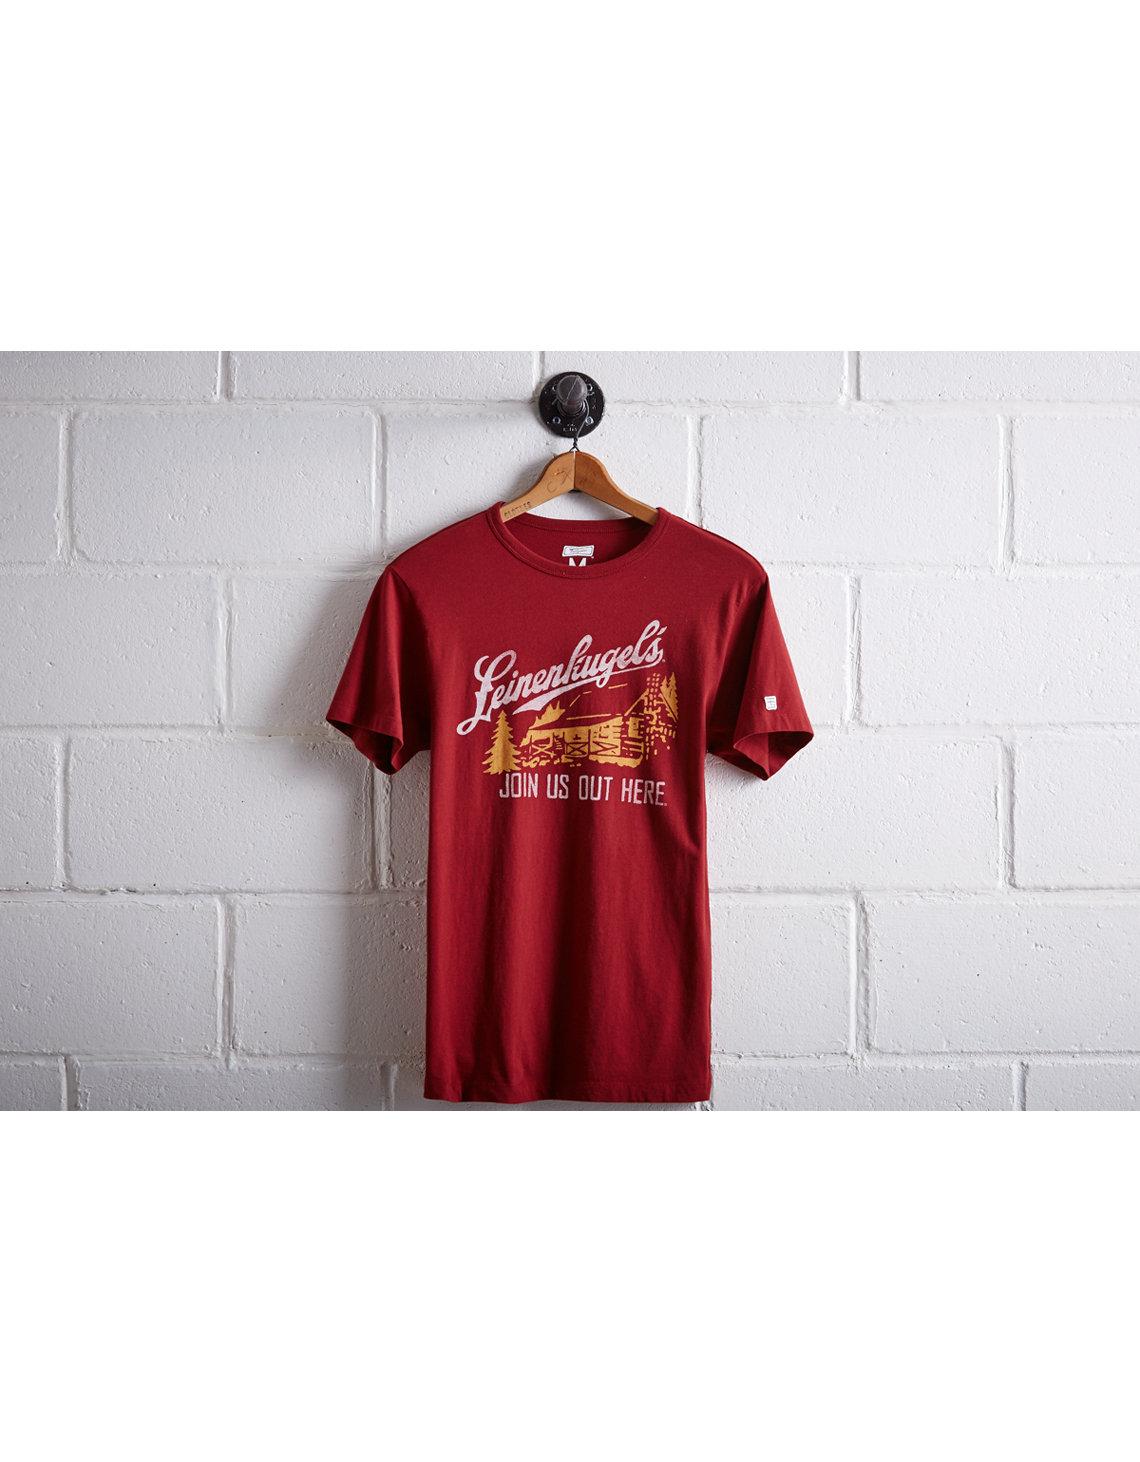 Tailgate Men's Leinenkugel T-Shirt. Placeholder image. Product Image. Online  Only